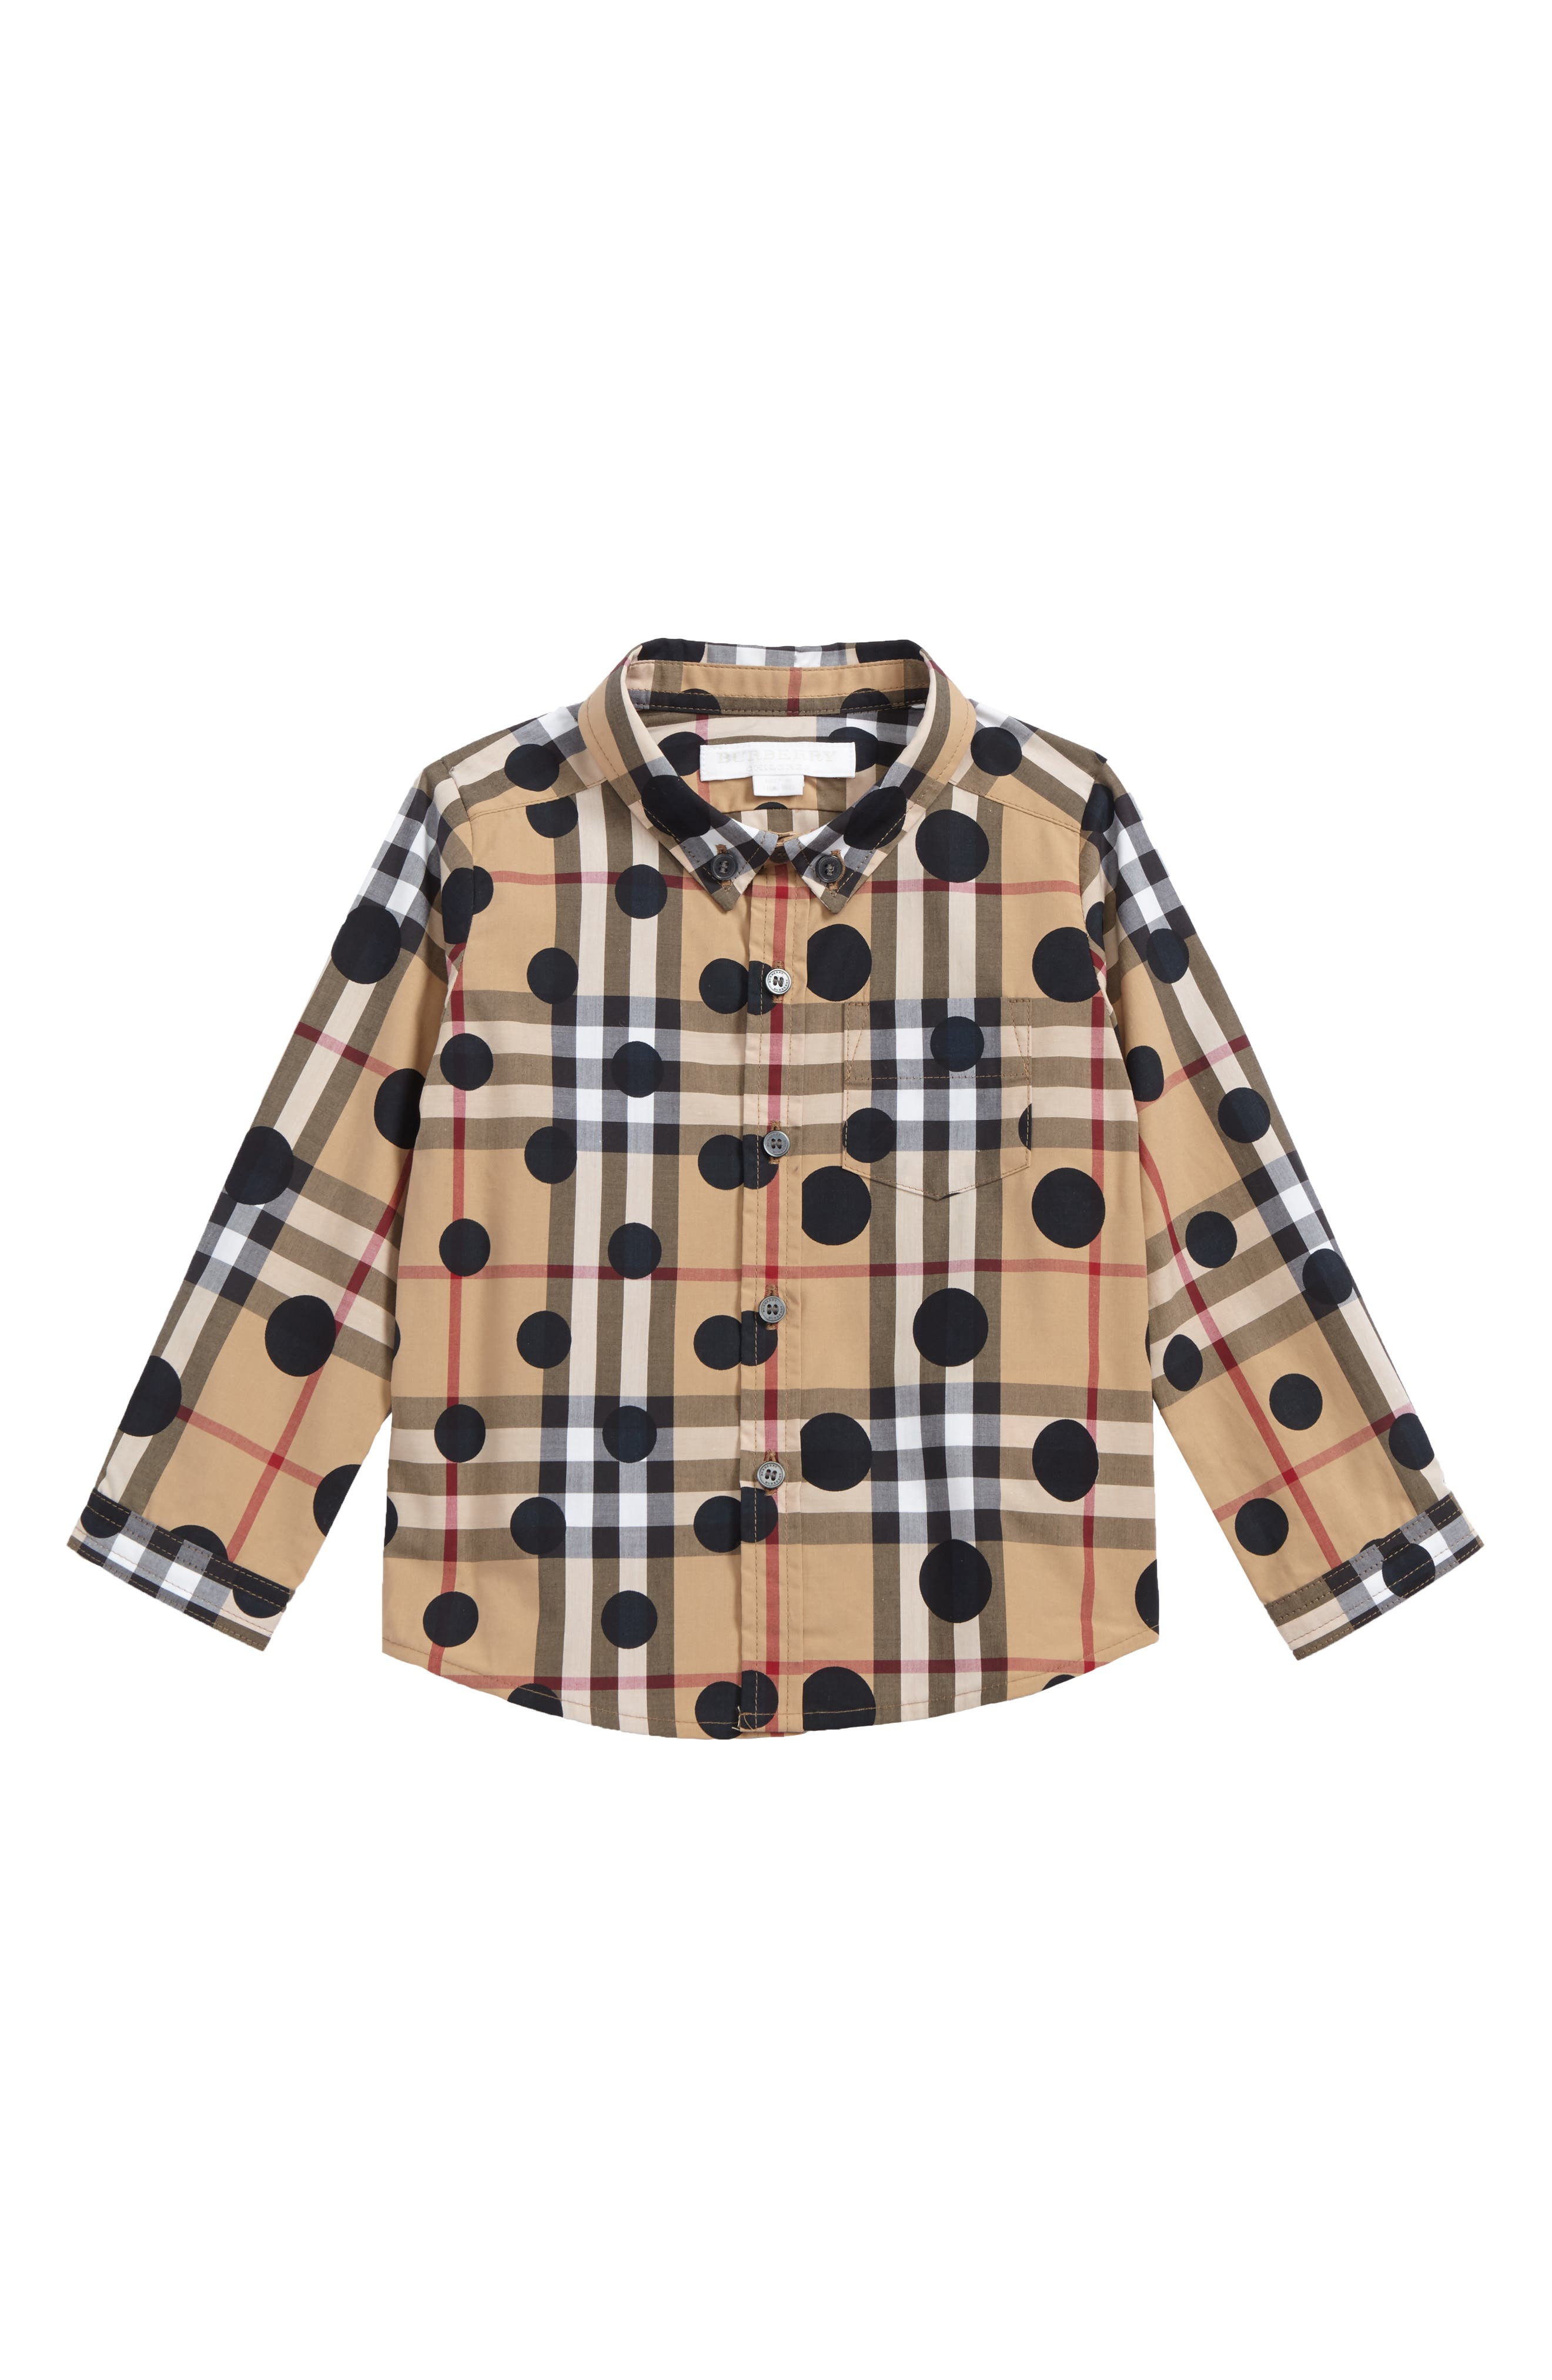 Mini Fred Polka Dot & Check Print Shirt,                             Main thumbnail 1, color,                             Beige